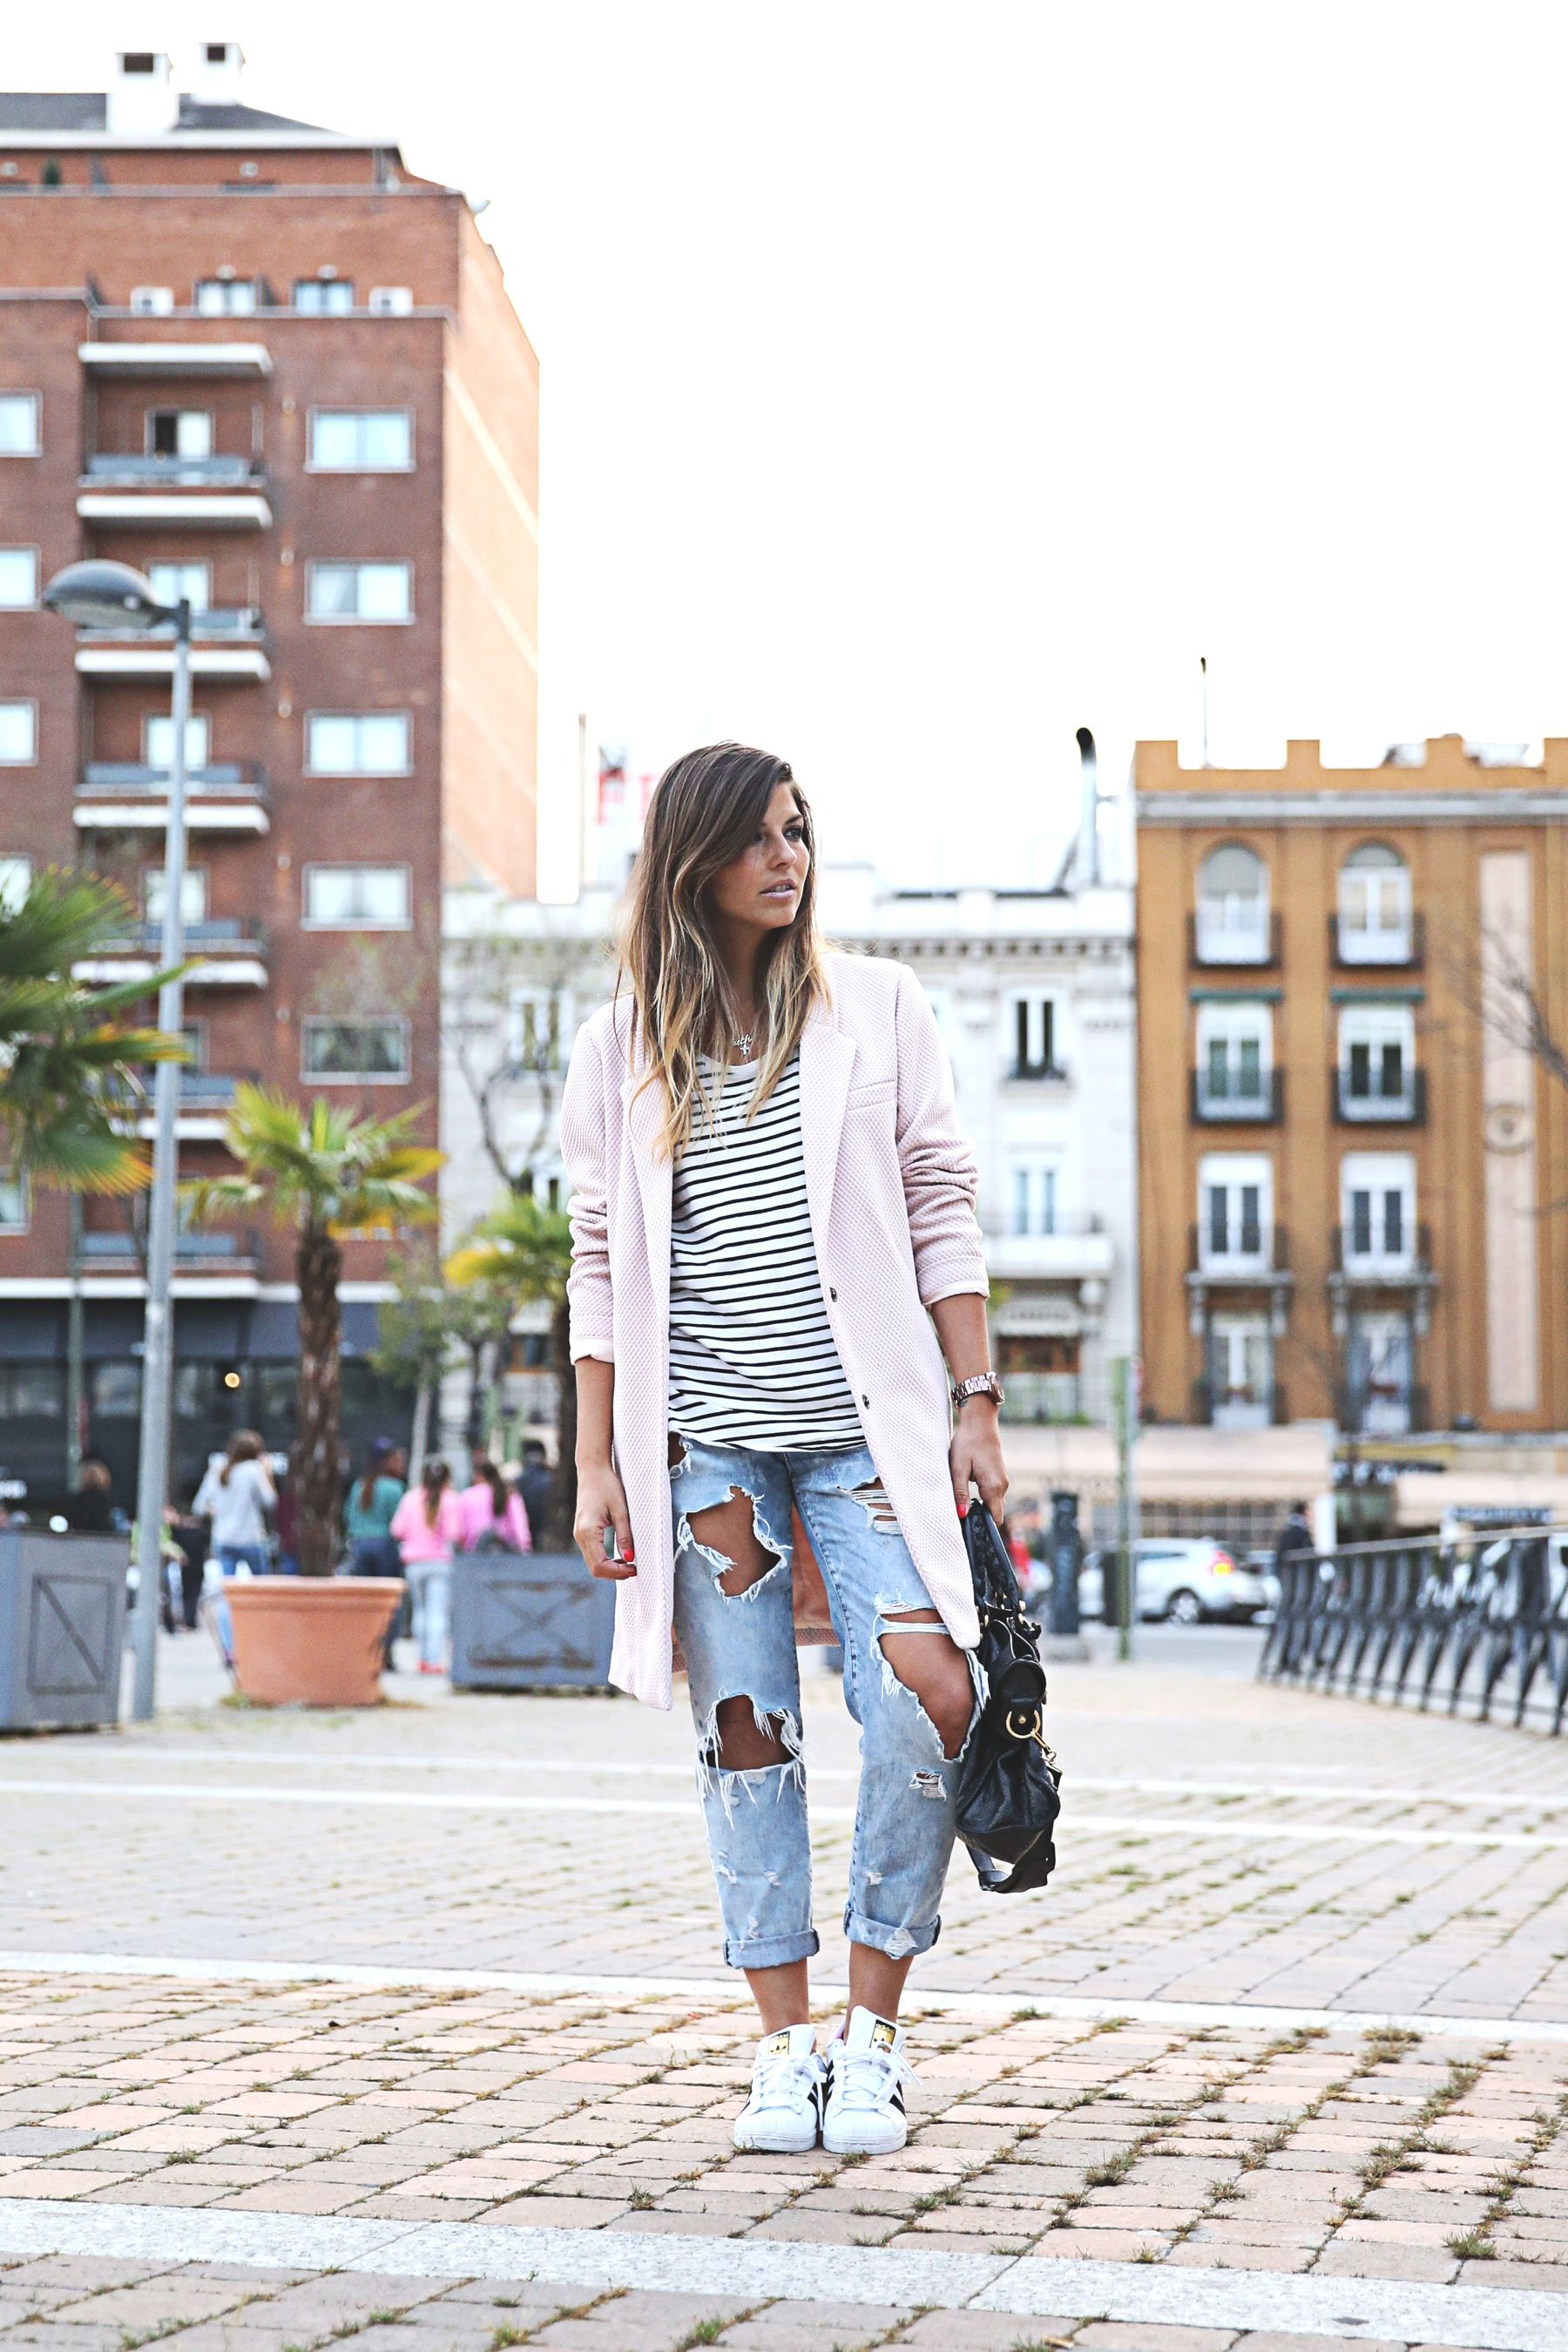 trendy-taste-look-outfit-street-style-sport-chic-camiseta -rayas-navy-marinero-boyfriend-ripped-jeans-vaqueros-rotos-adidas-superstar-4 529c481f21aa7